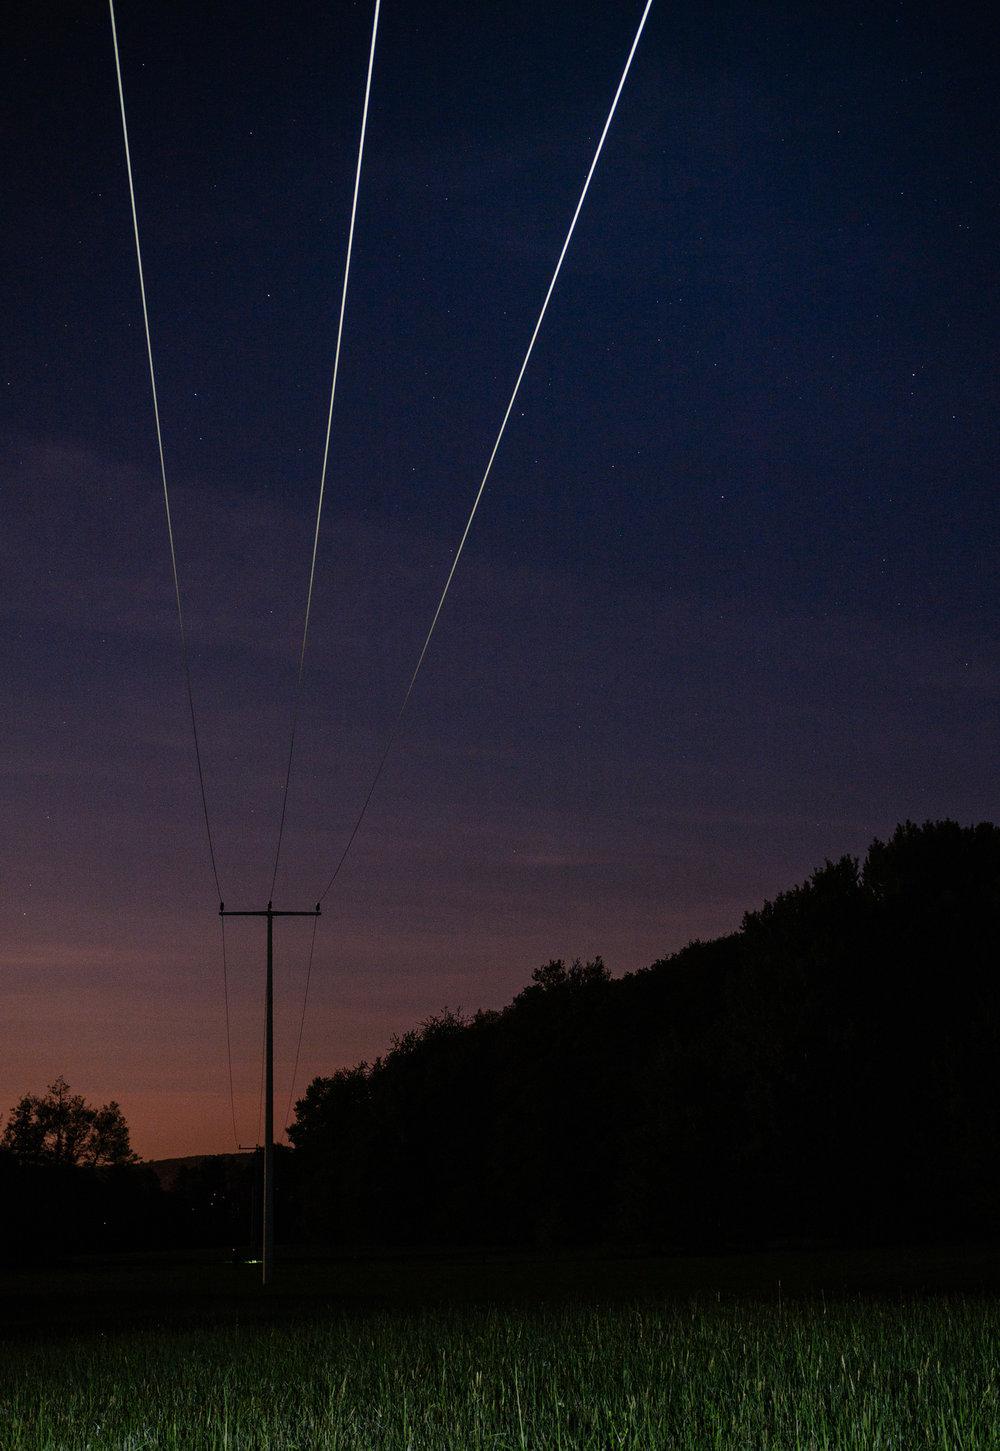 nachts-07.jpg